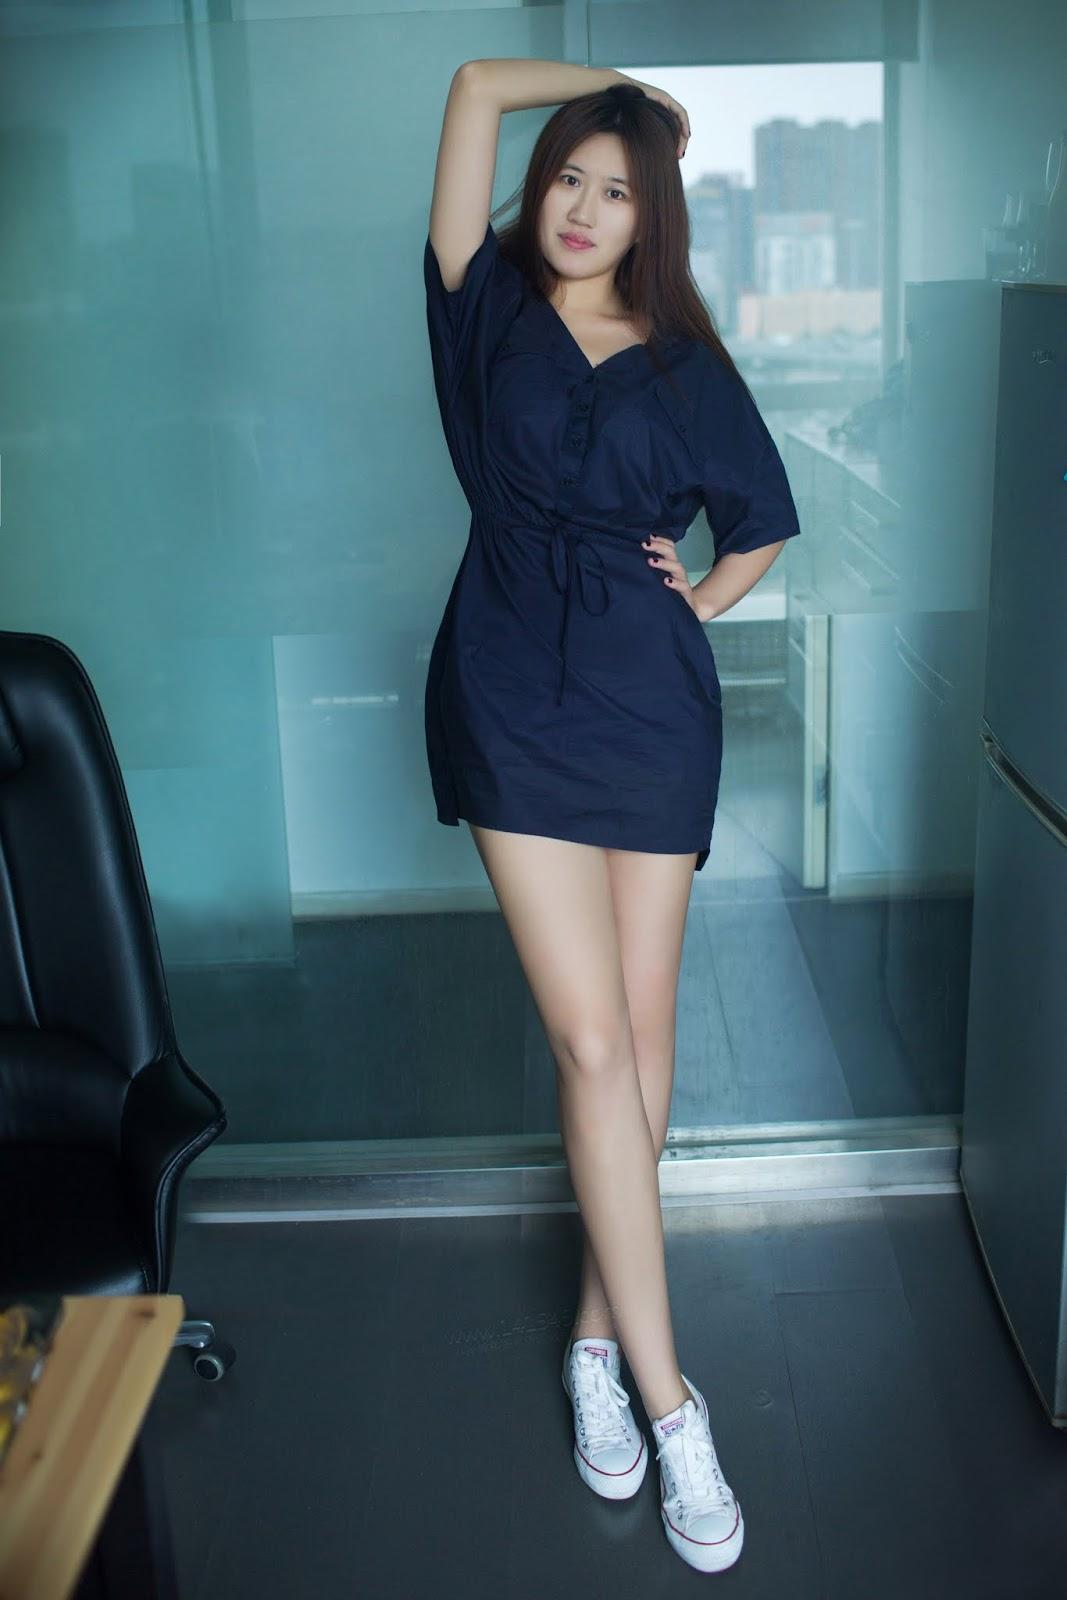 Jessica%2B%25282%2529 - TuiGirl No.60